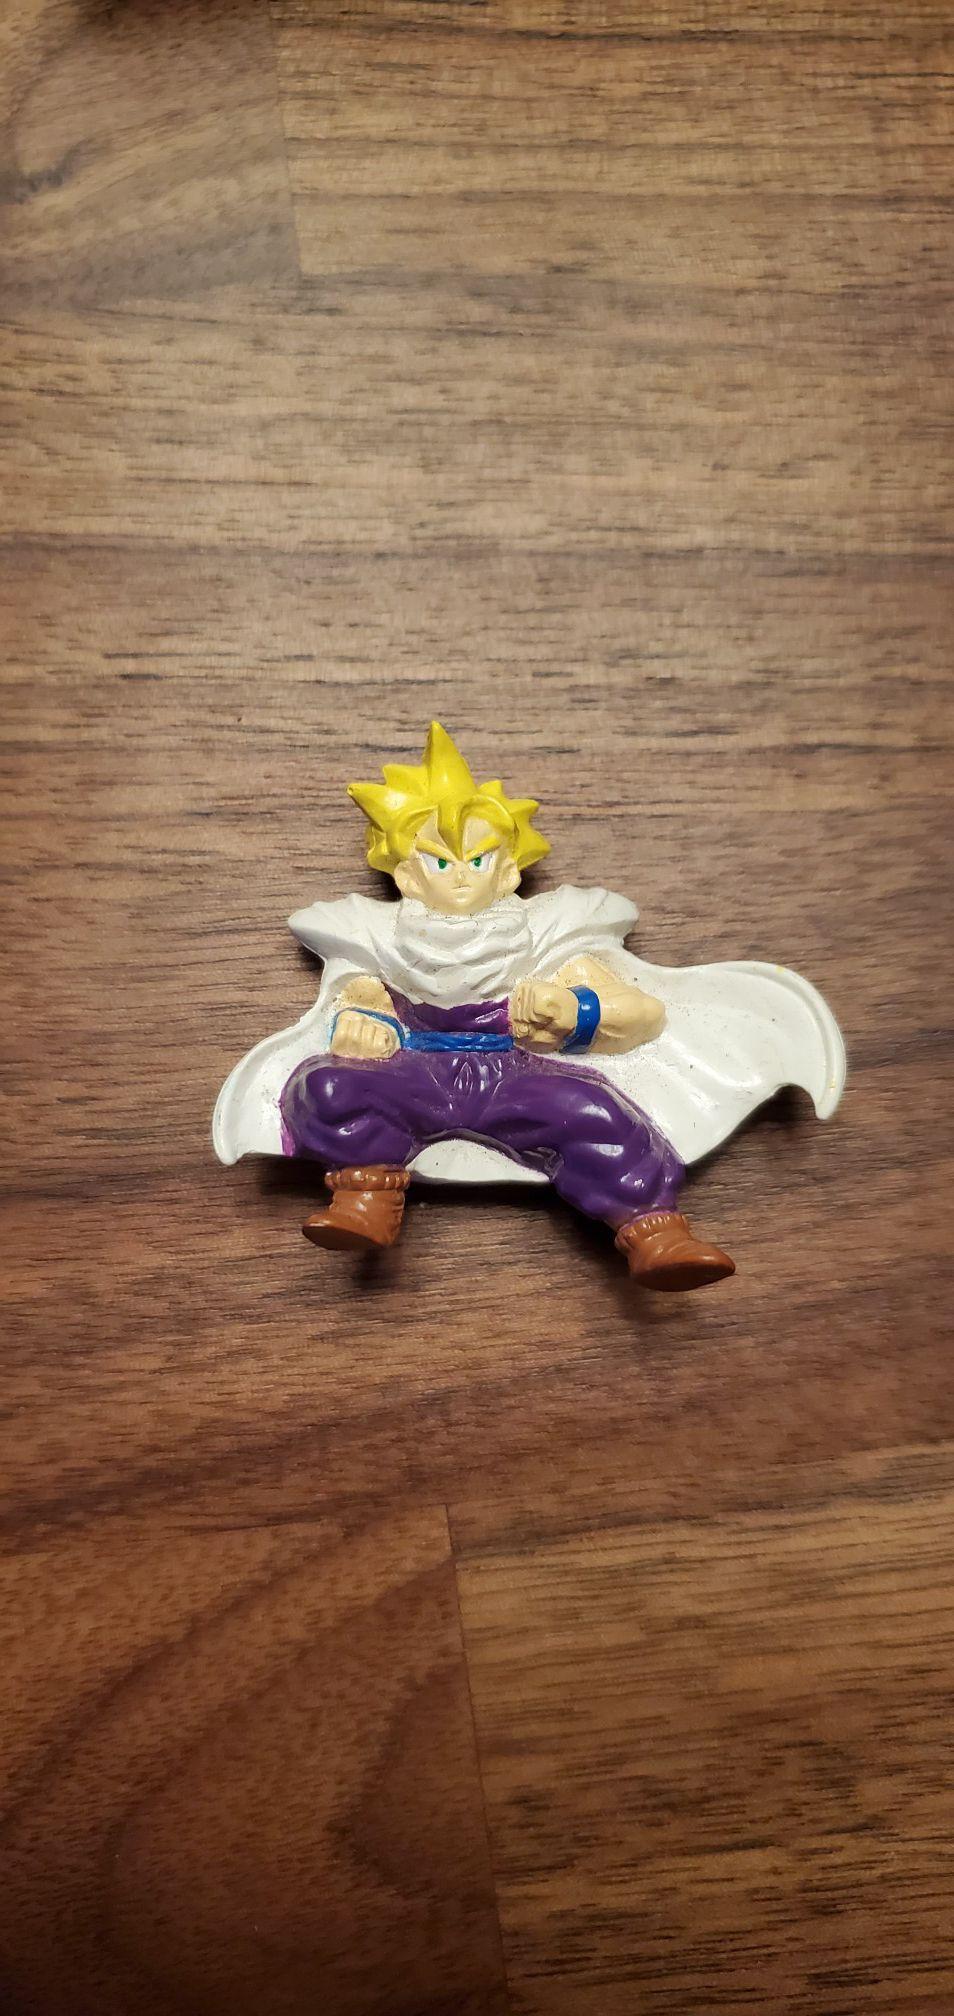 Vintage mini figurines - Dragonball Z - Bandai 1996